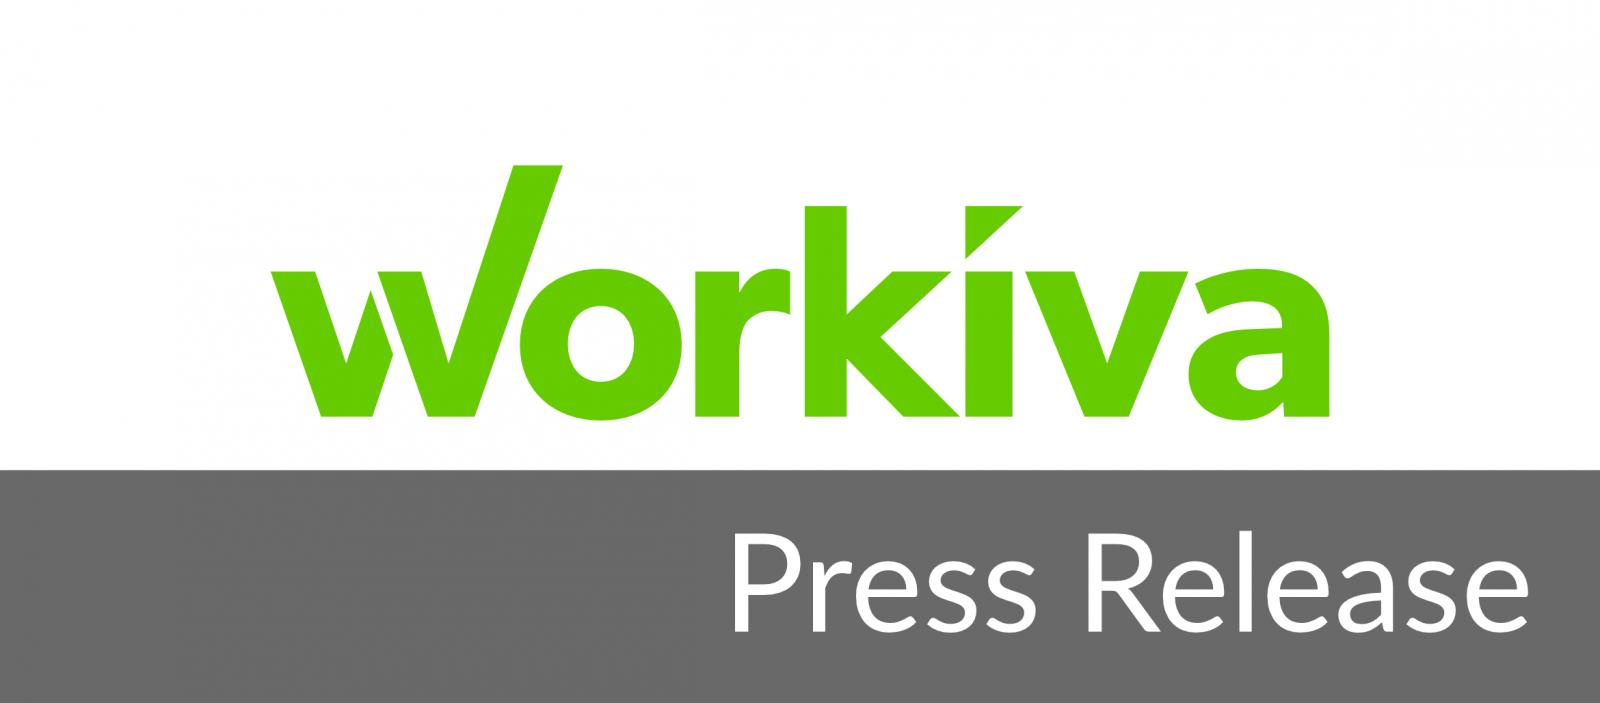 Workiva press release